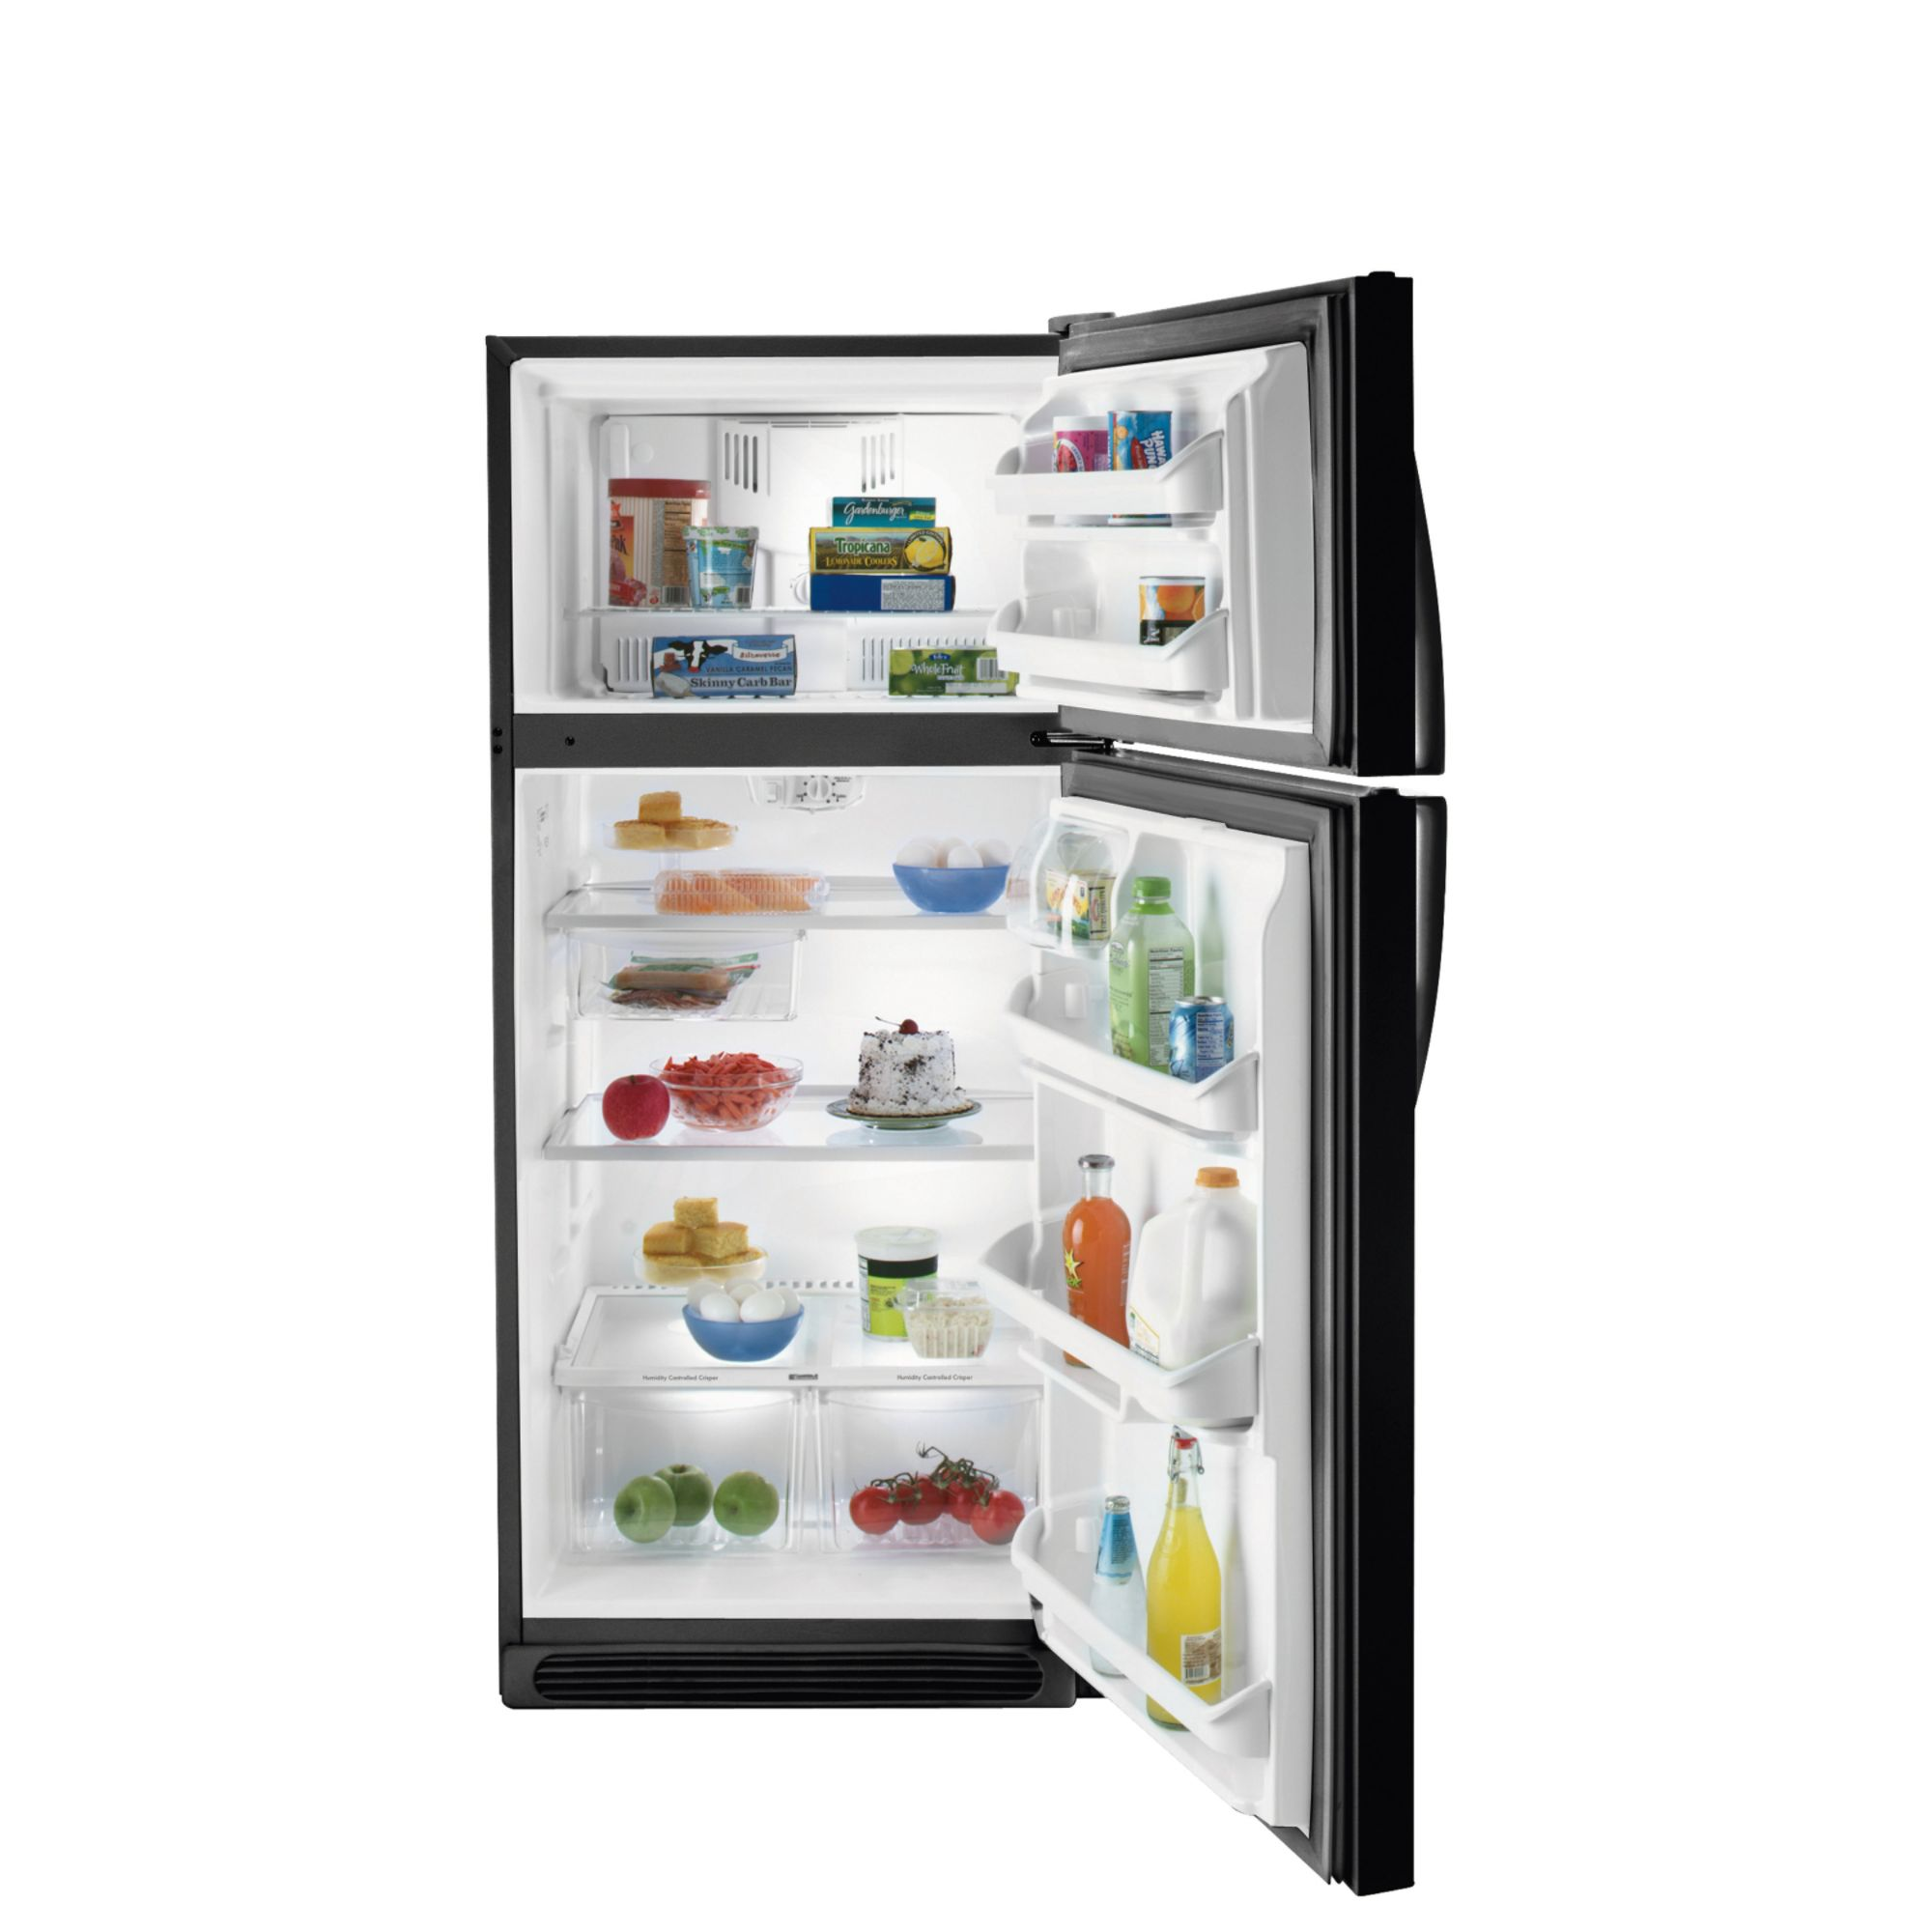 Kenmore 17.0 cu. ft. Top-Freezer Refrigerator